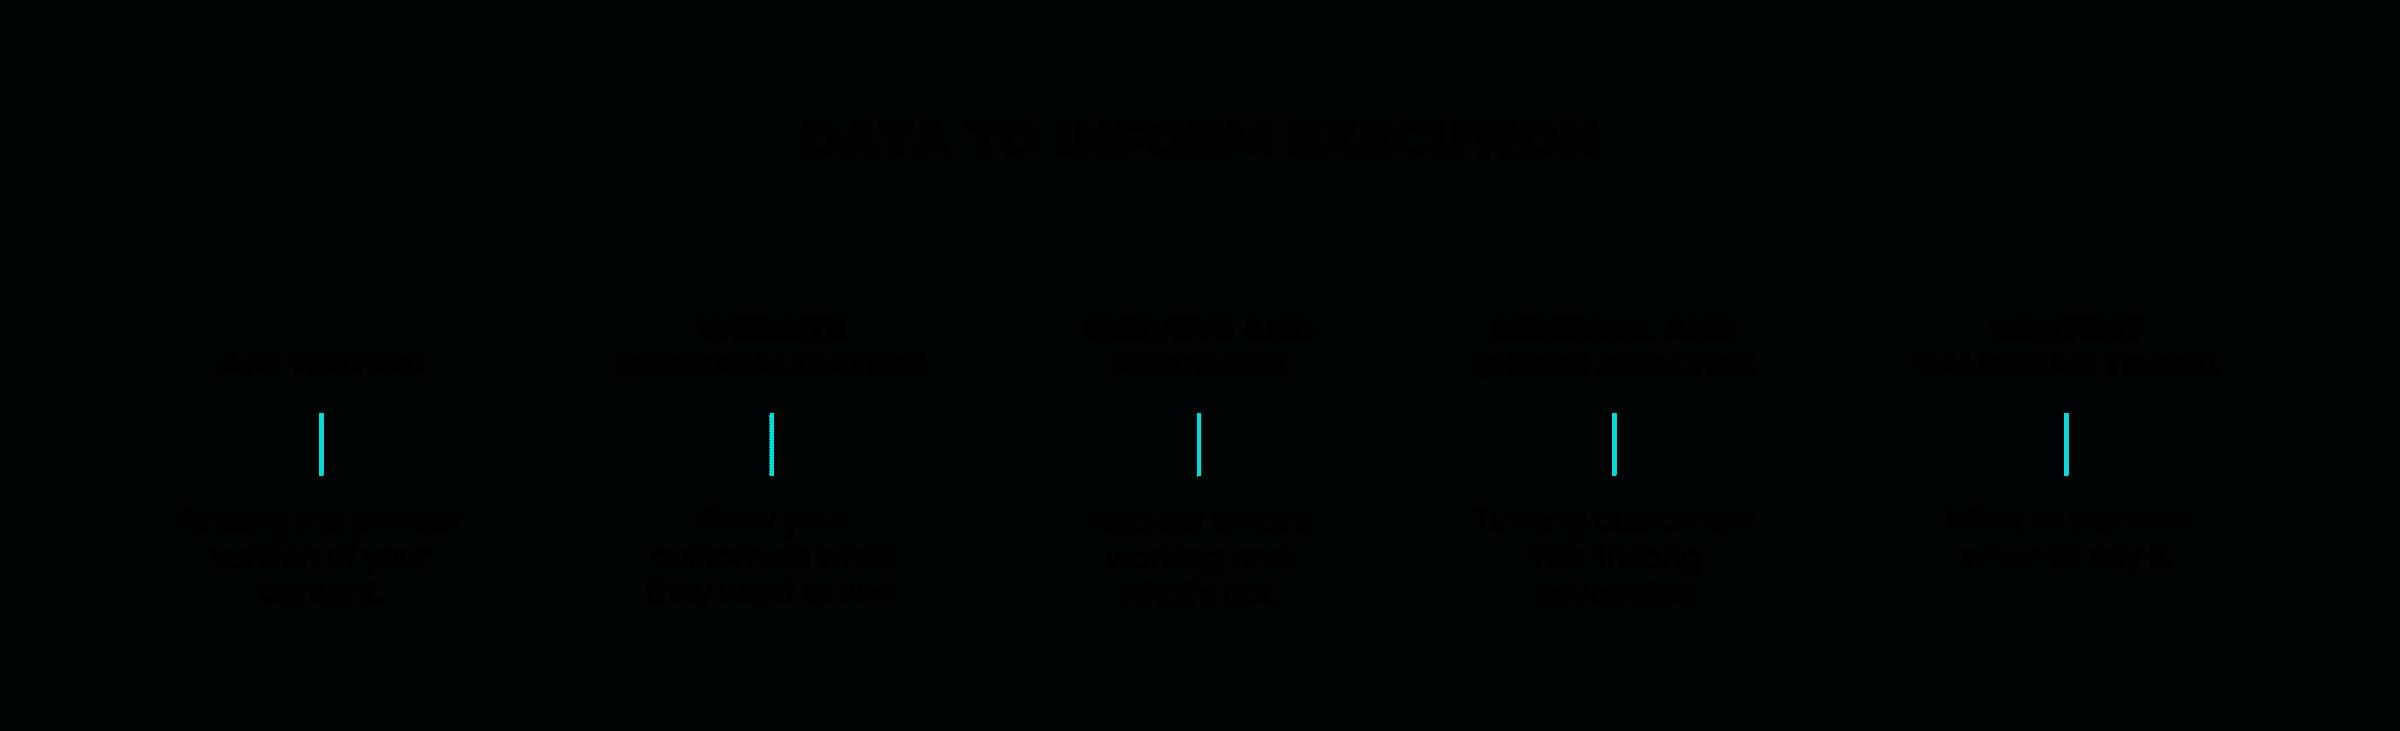 Data to inform execution